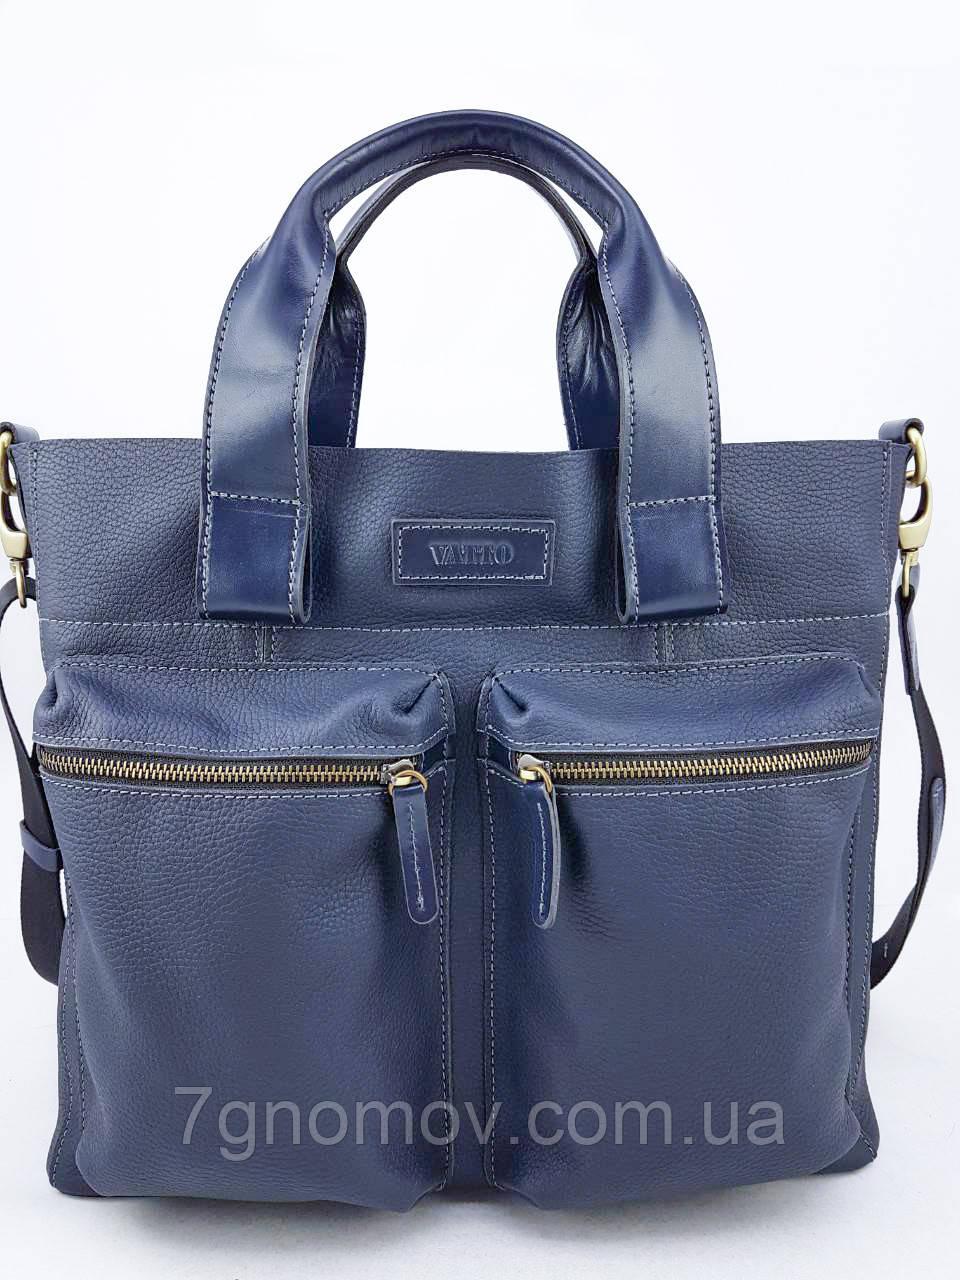 Мужская сумка VATTO Mk6.8 F1Kaz600